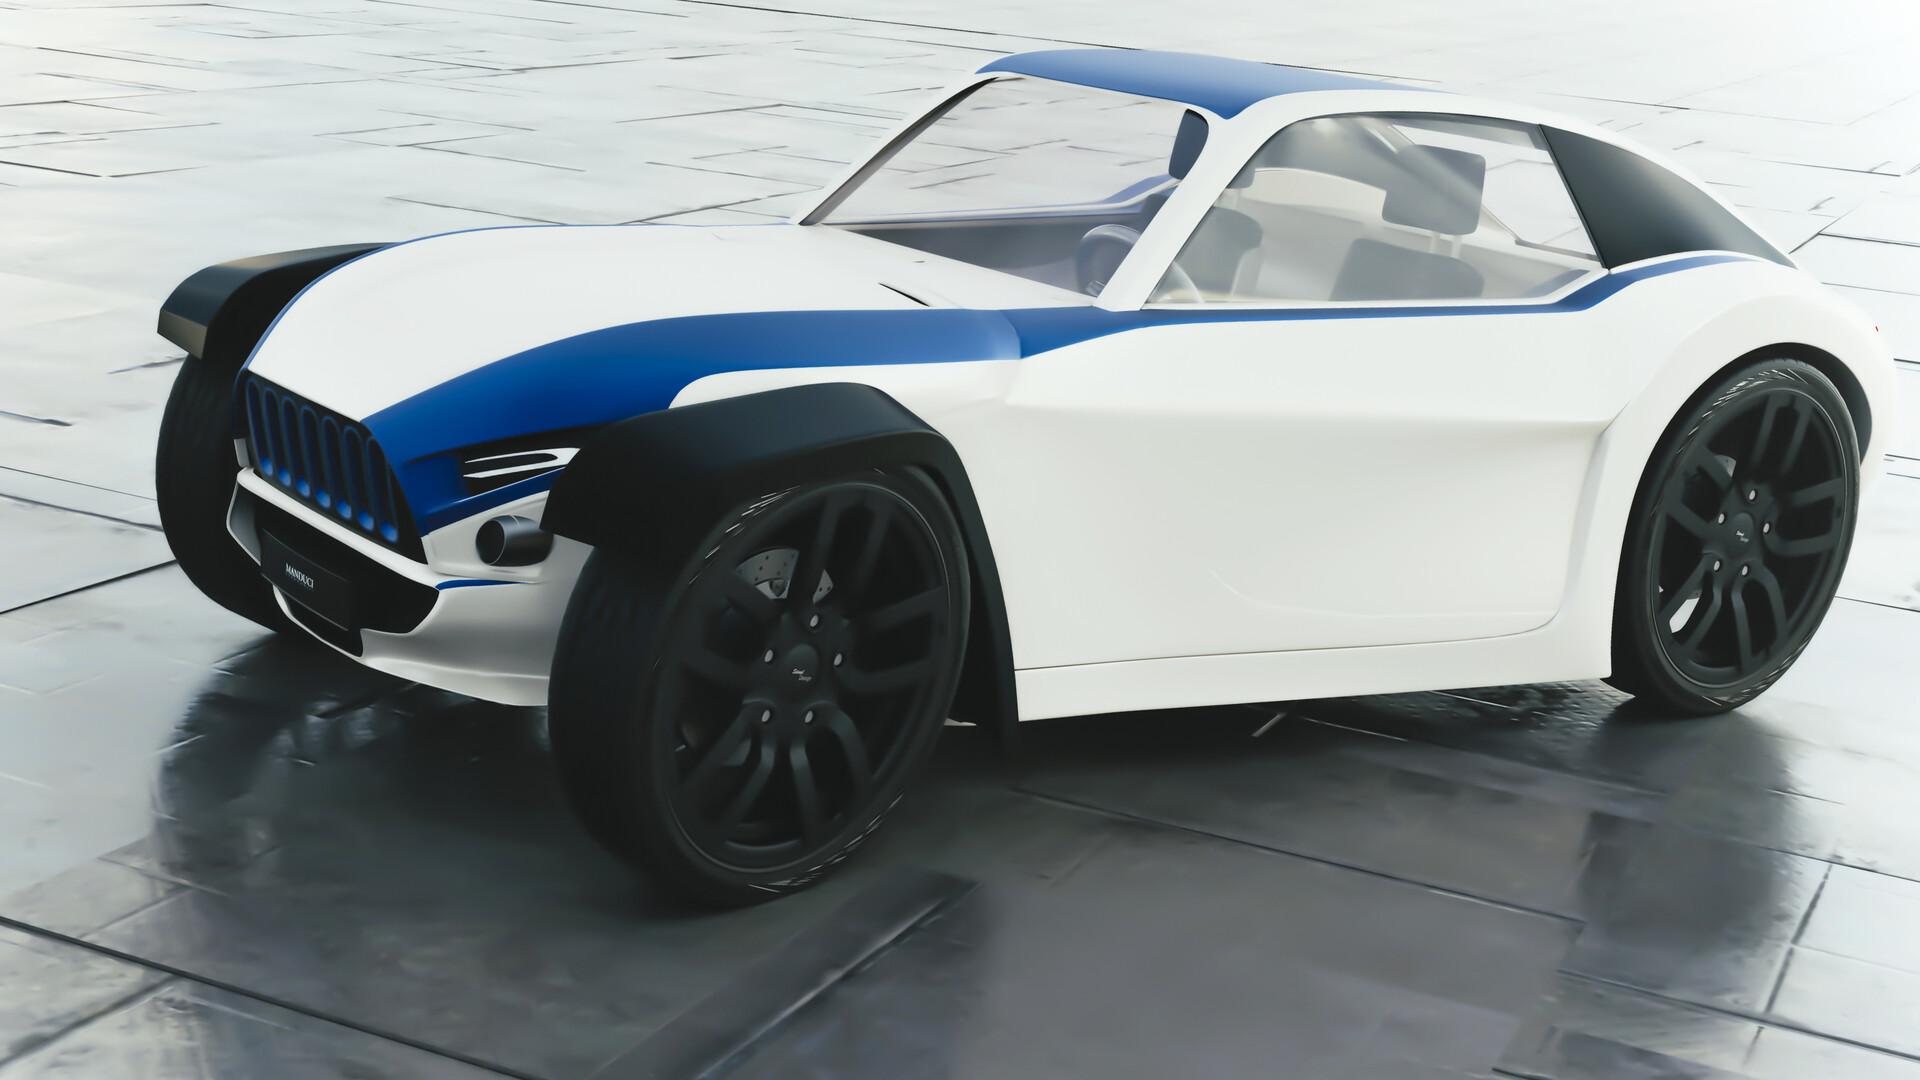 David stingl il furfante concept rev1 blue n white modern front